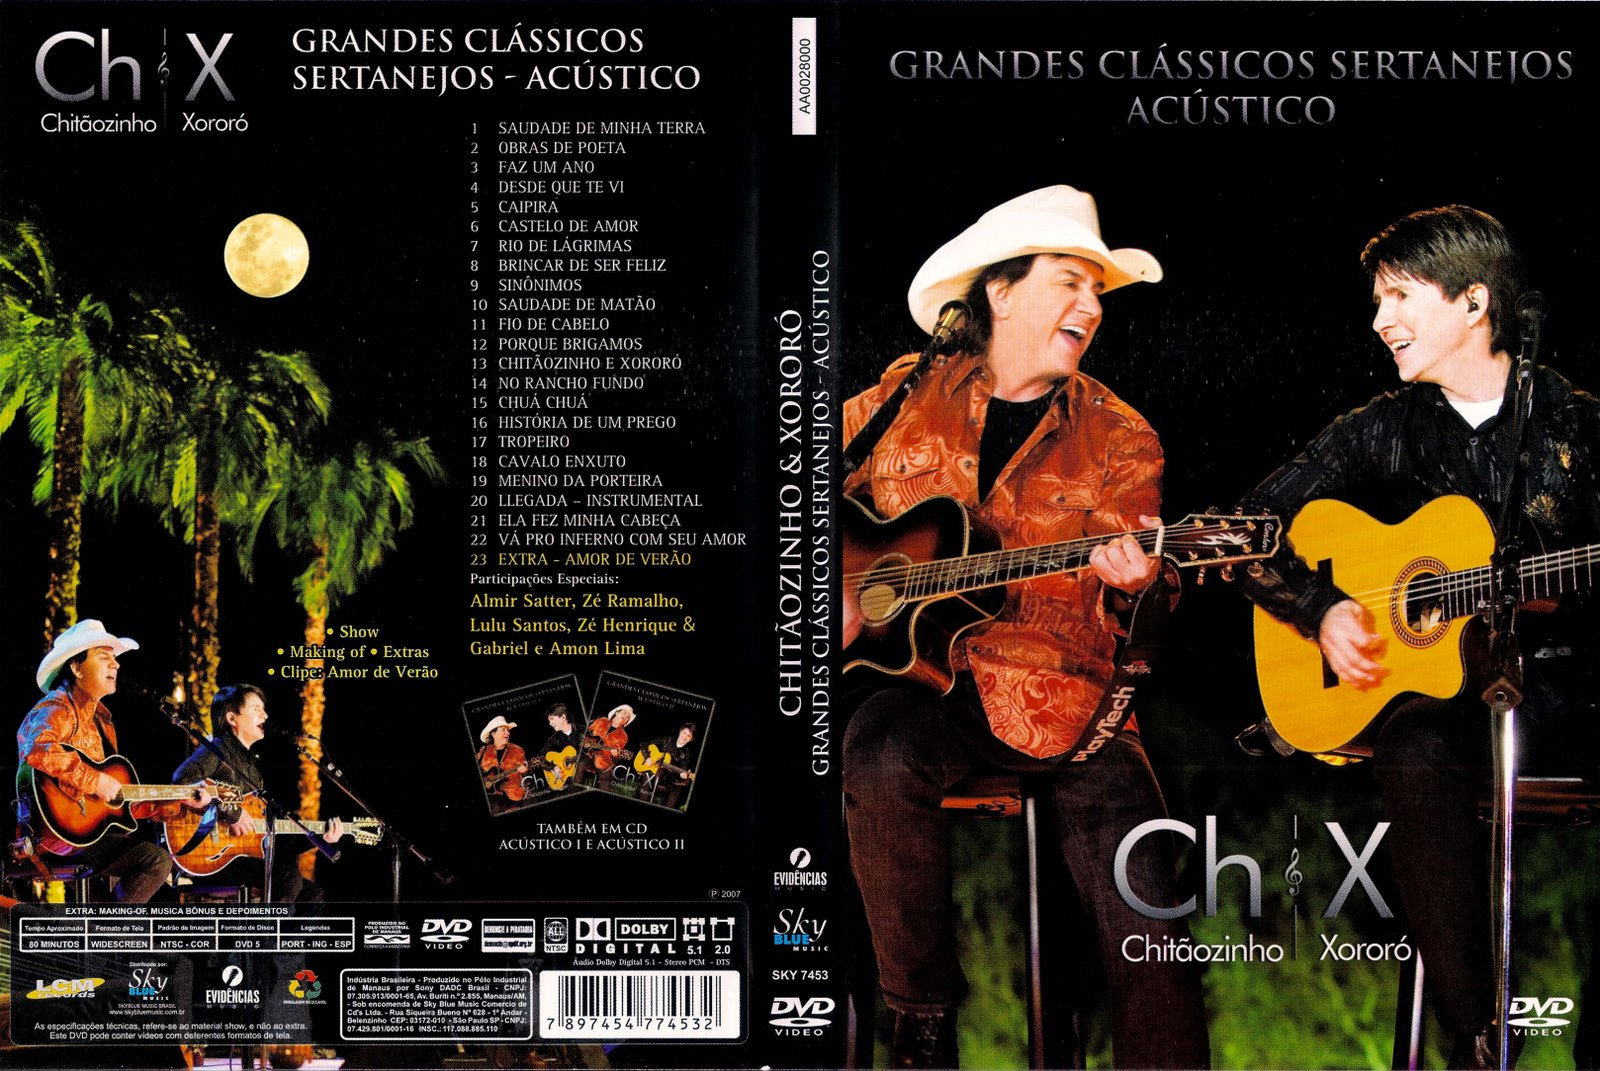 Chitãozinho e Xororó Grandes Clássicos DVDRip XviD Nacional Chit C3 A3ozinho e Xoror C3 B3   Grandes Cl C3 A1ssicos